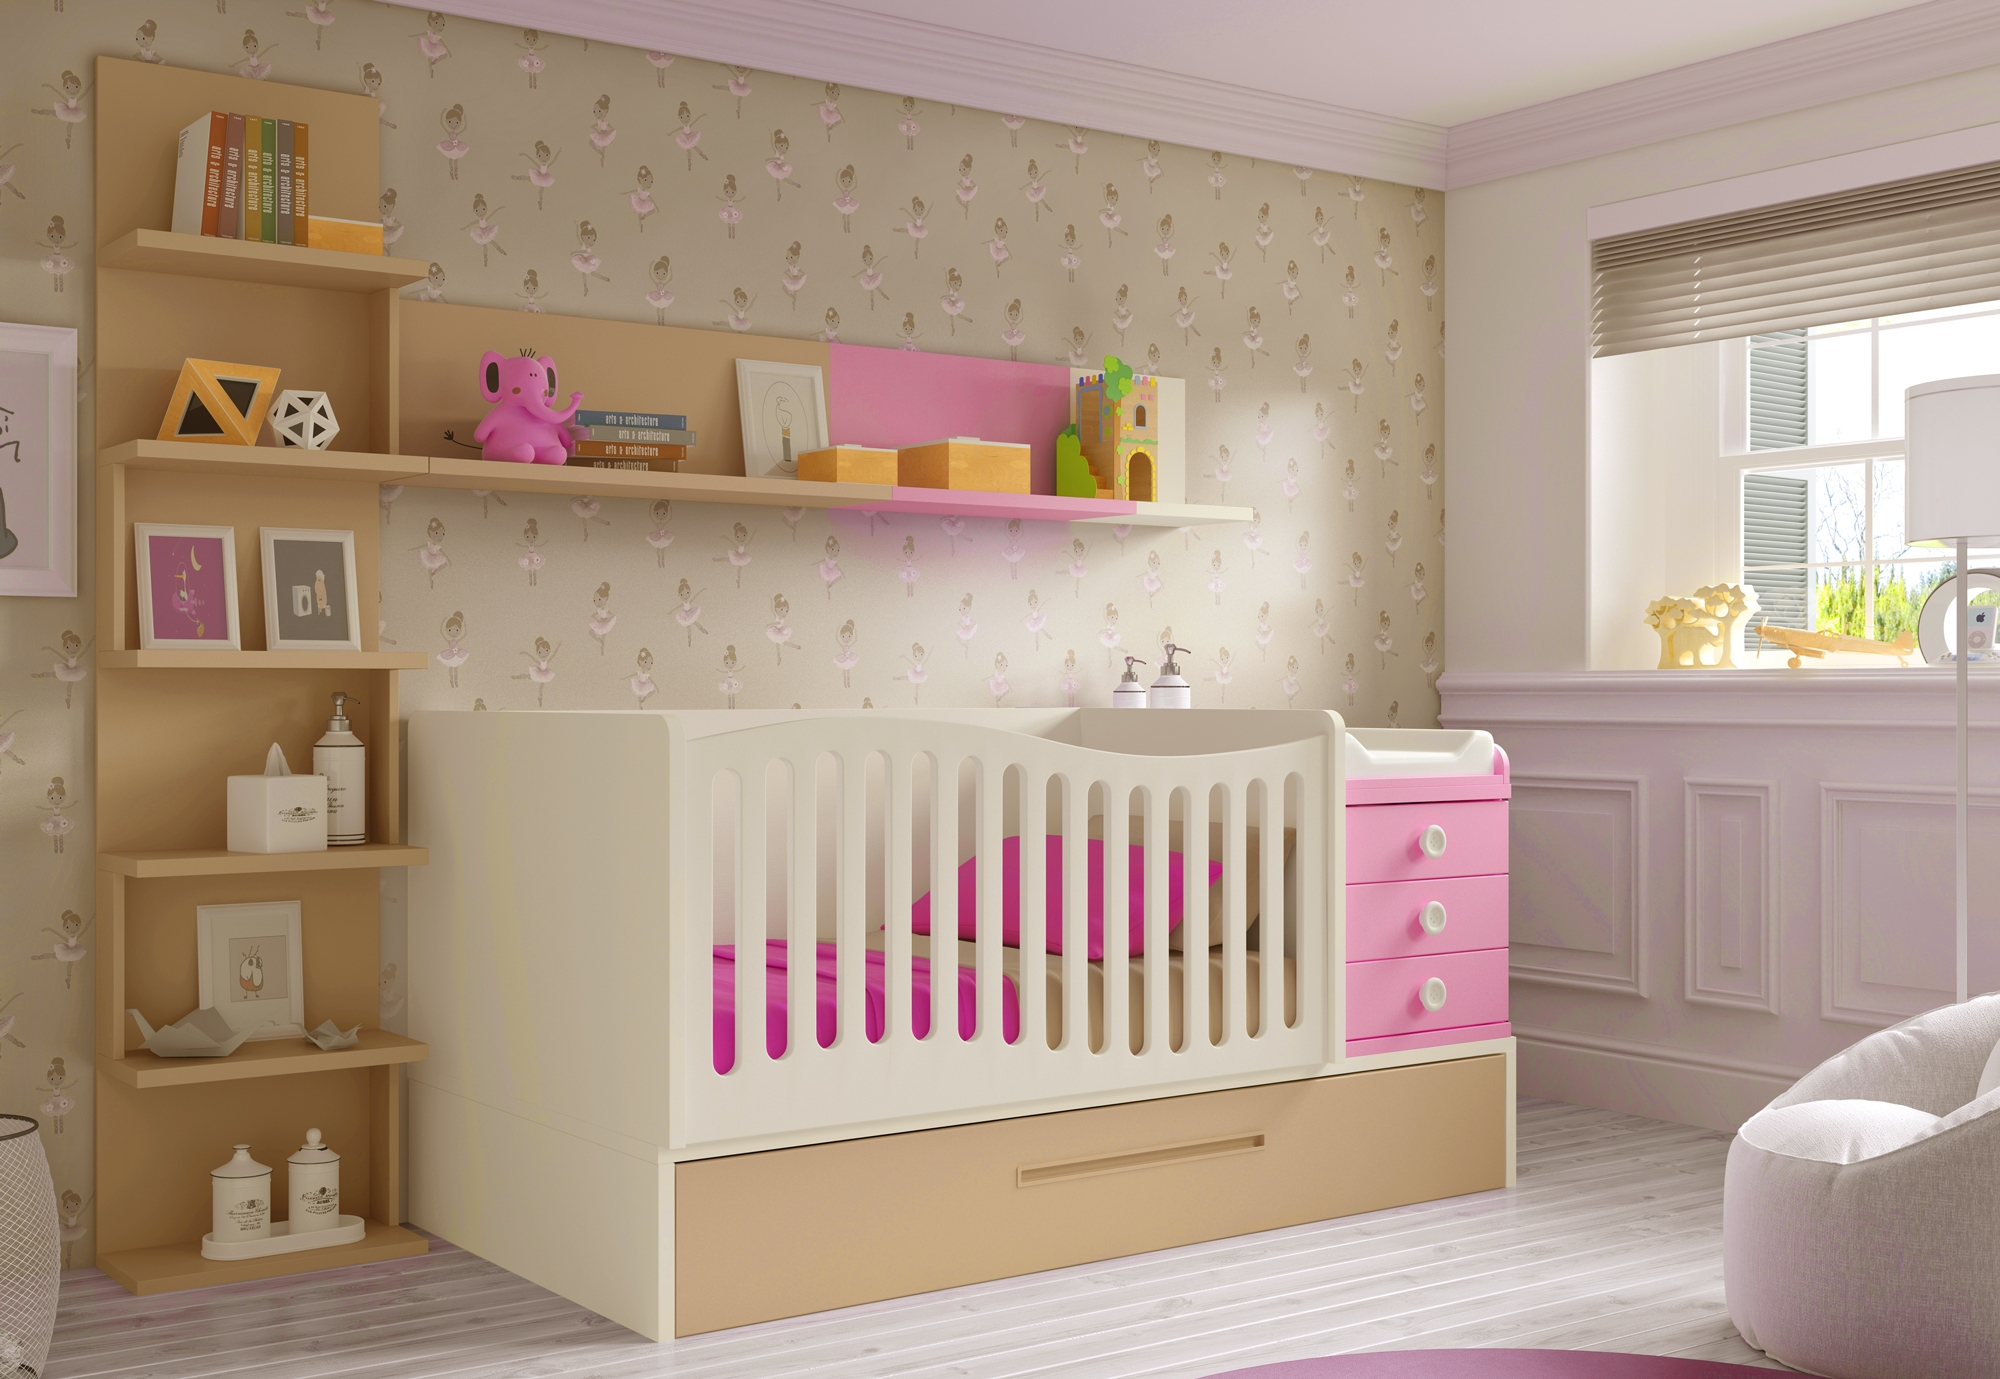 j ai essay le berceau waldin voici mon avis. Black Bedroom Furniture Sets. Home Design Ideas